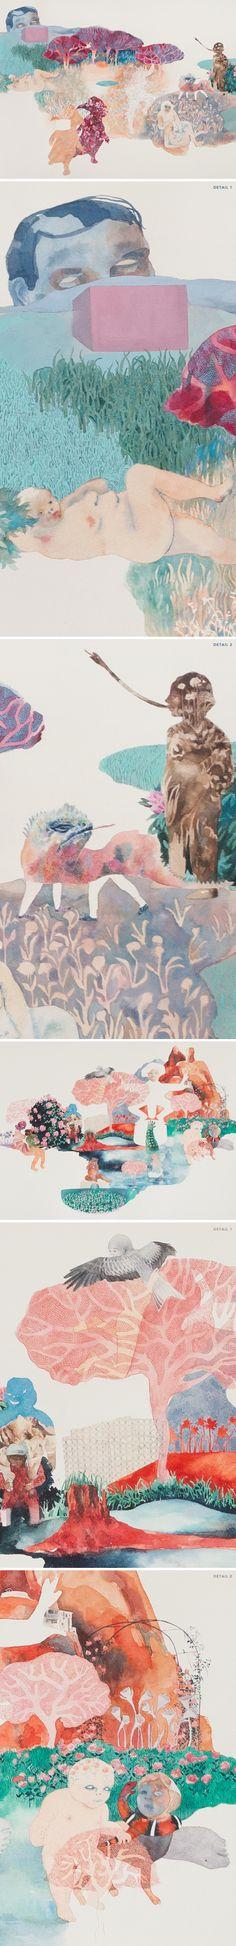 watercolor worlds by sara khan <3